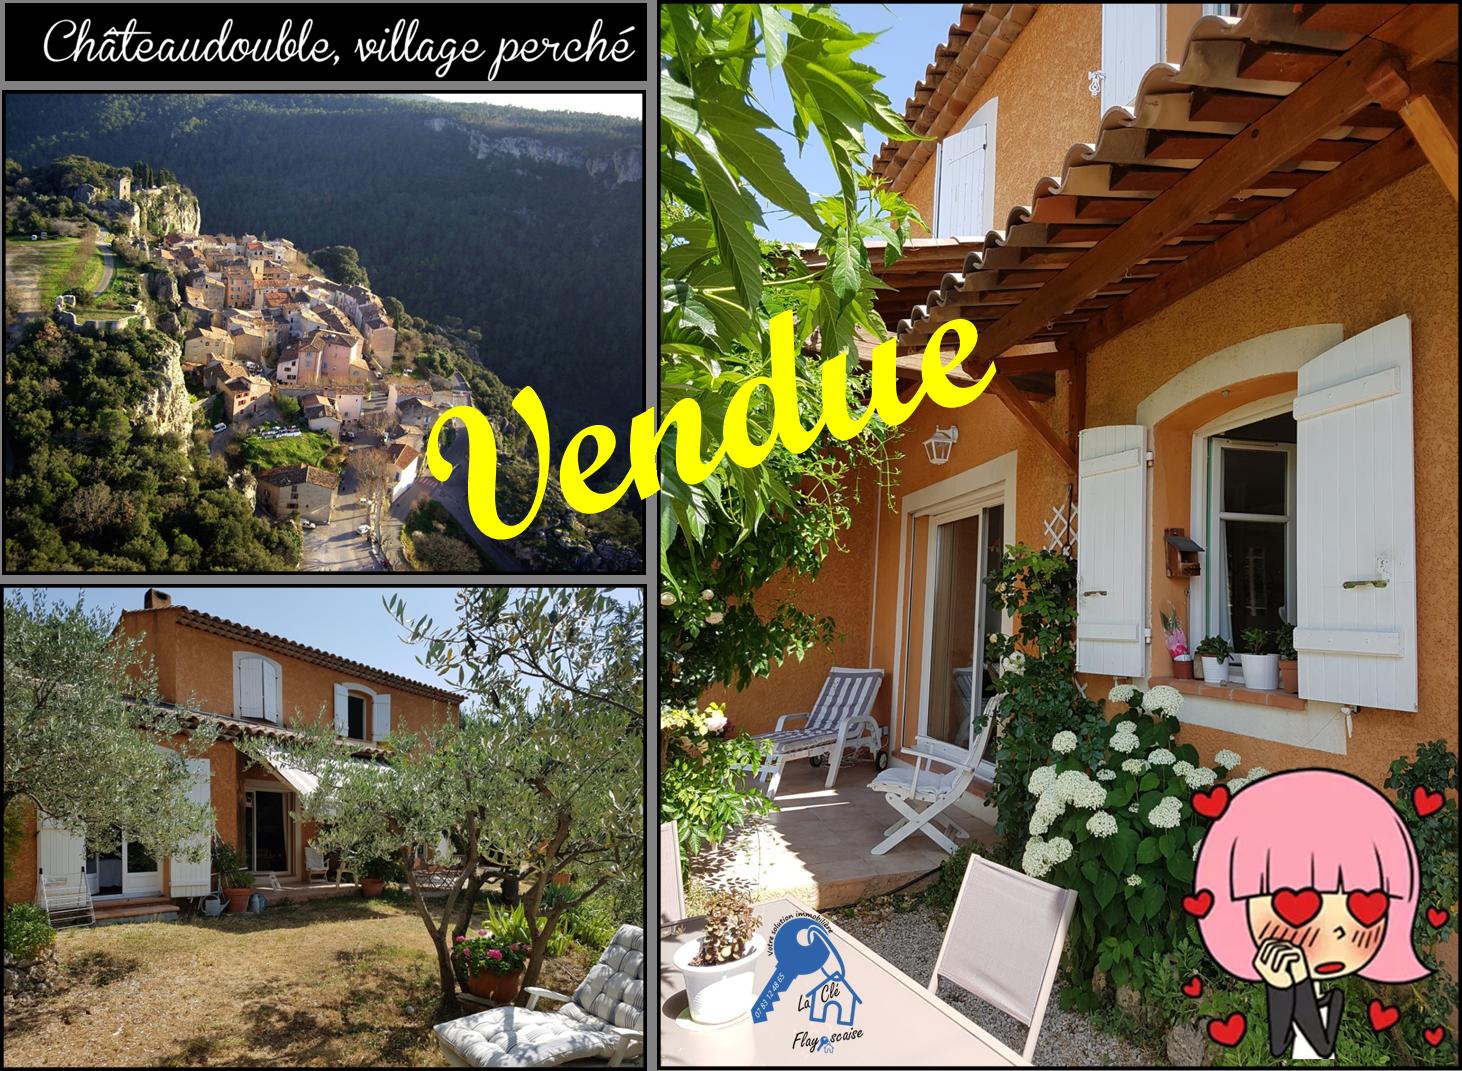 Chateaudouble - 338 000 € - 3 chambres - Terrain 3840 m²